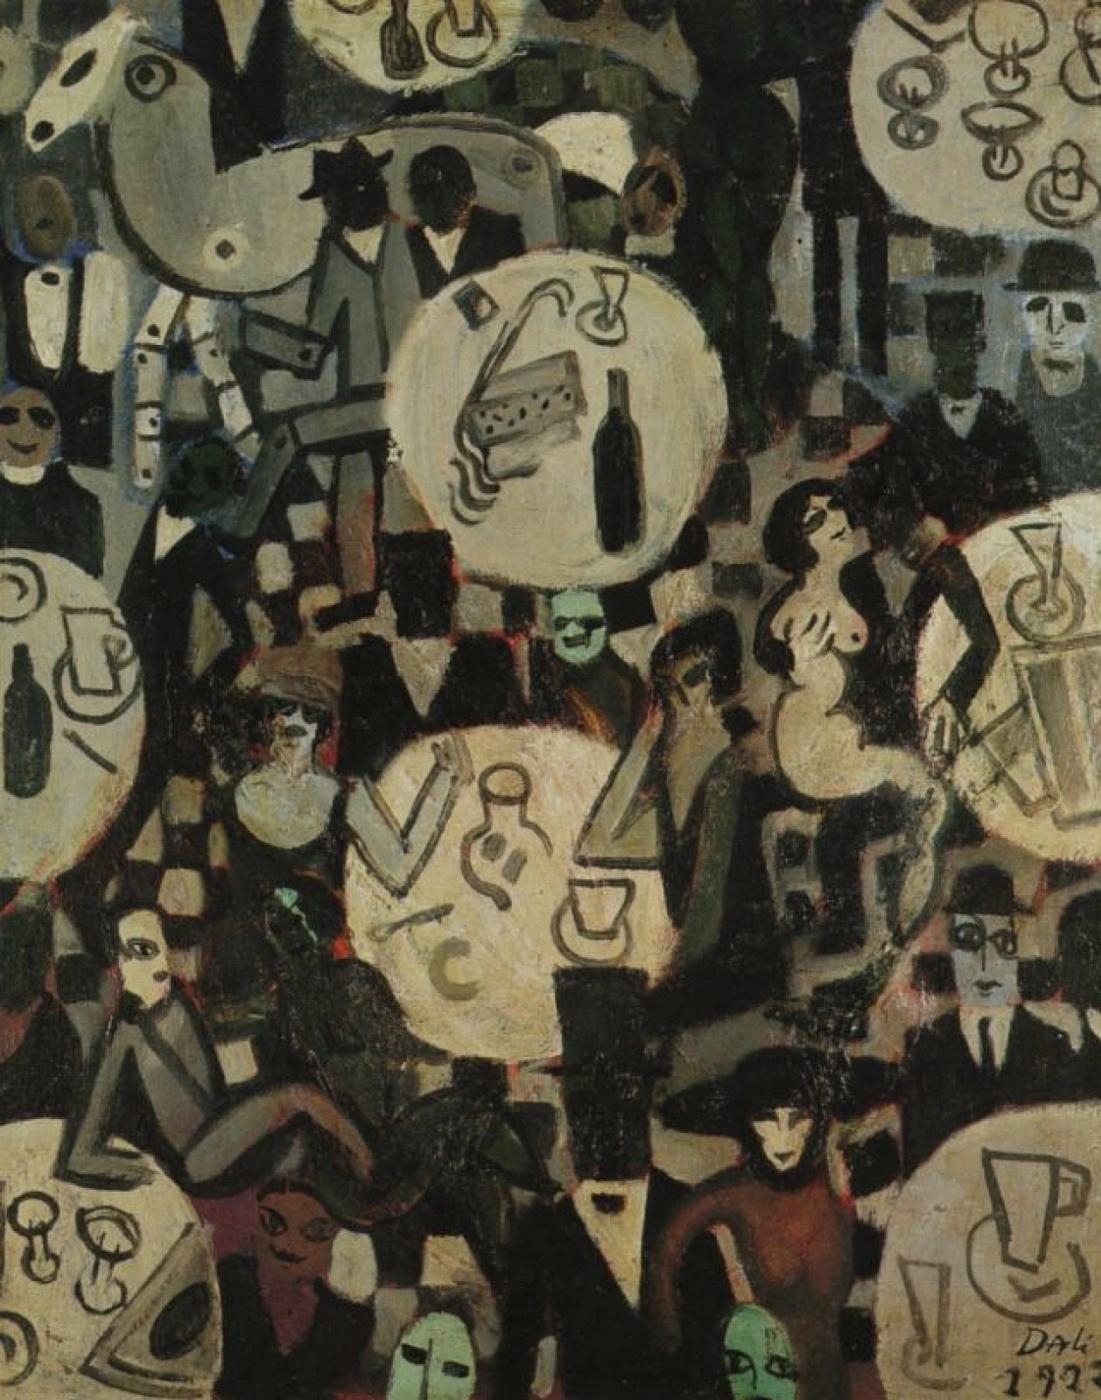 Salvador Dale. Cabaret scene